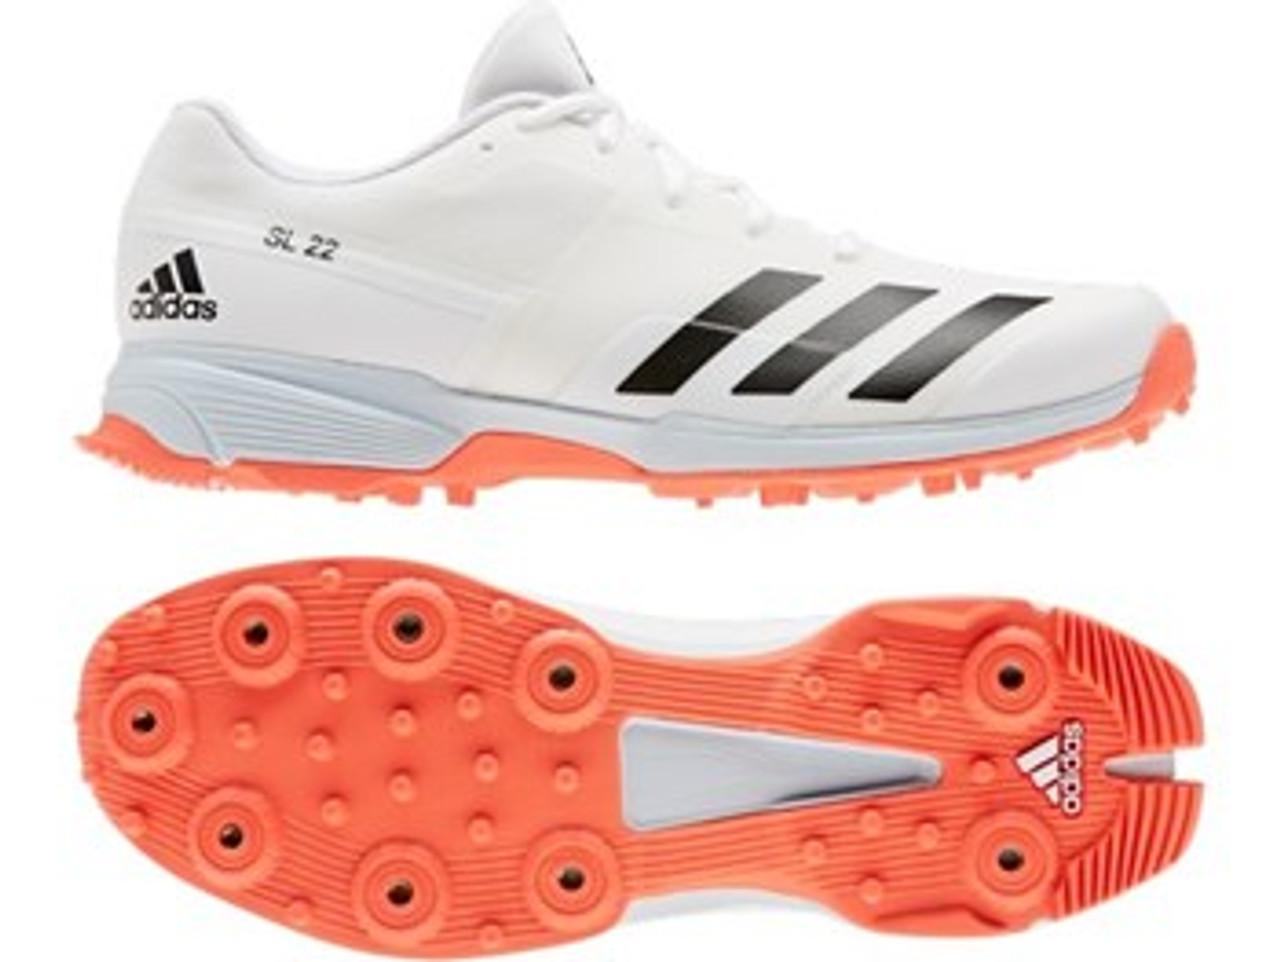 Adidas SL22 YDS Cricket Shoes 2020